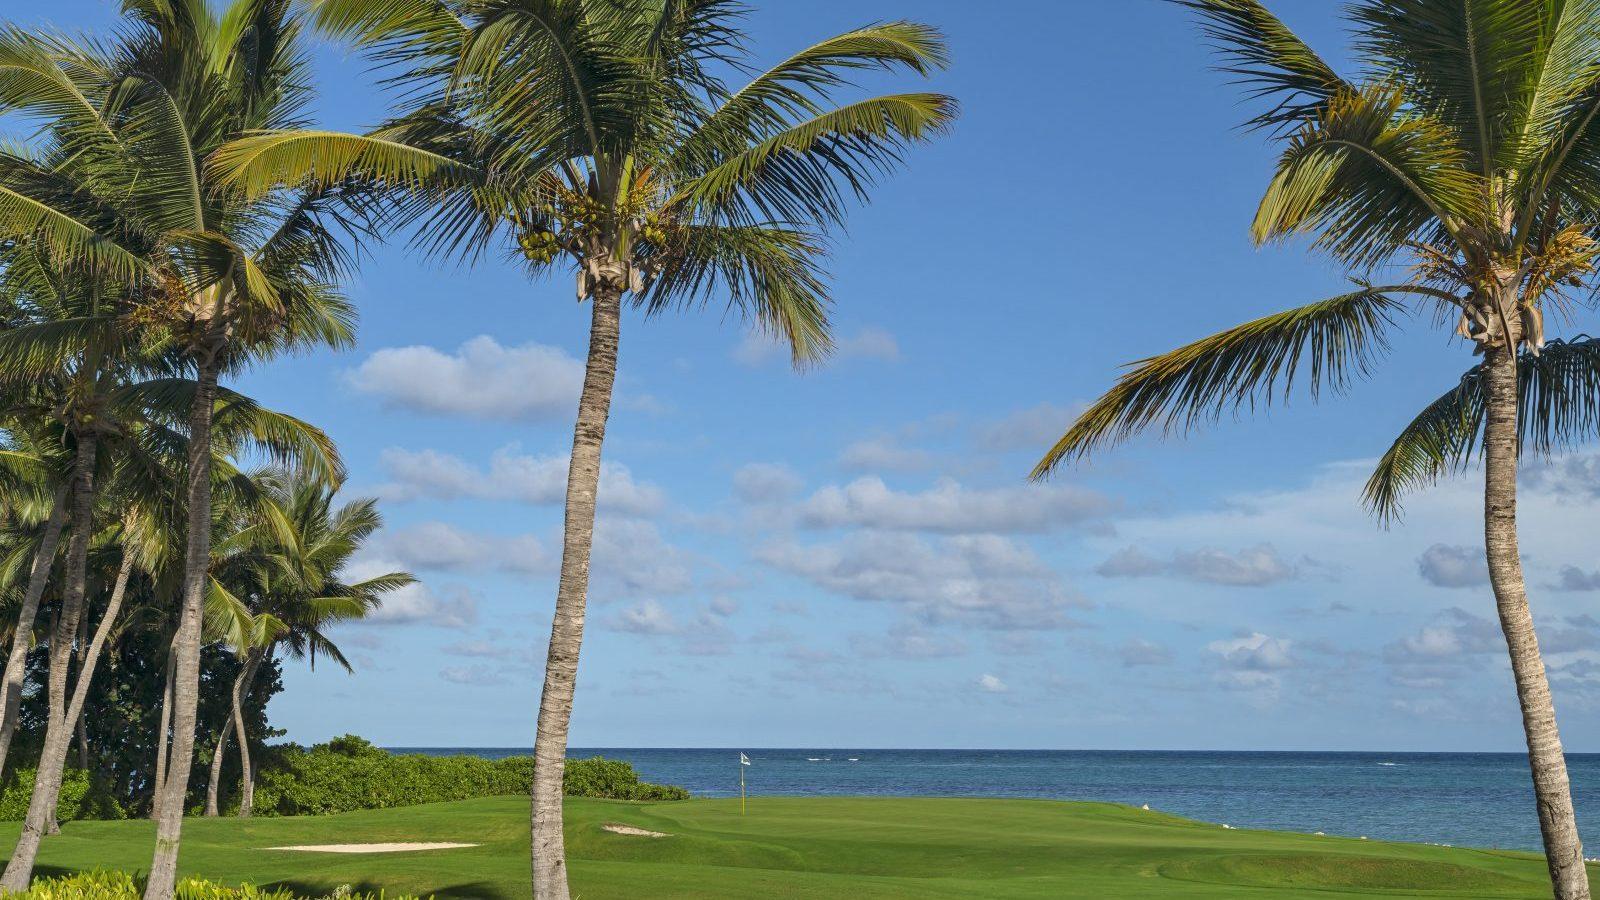 La-Cana-golf-course-Punta-Cana